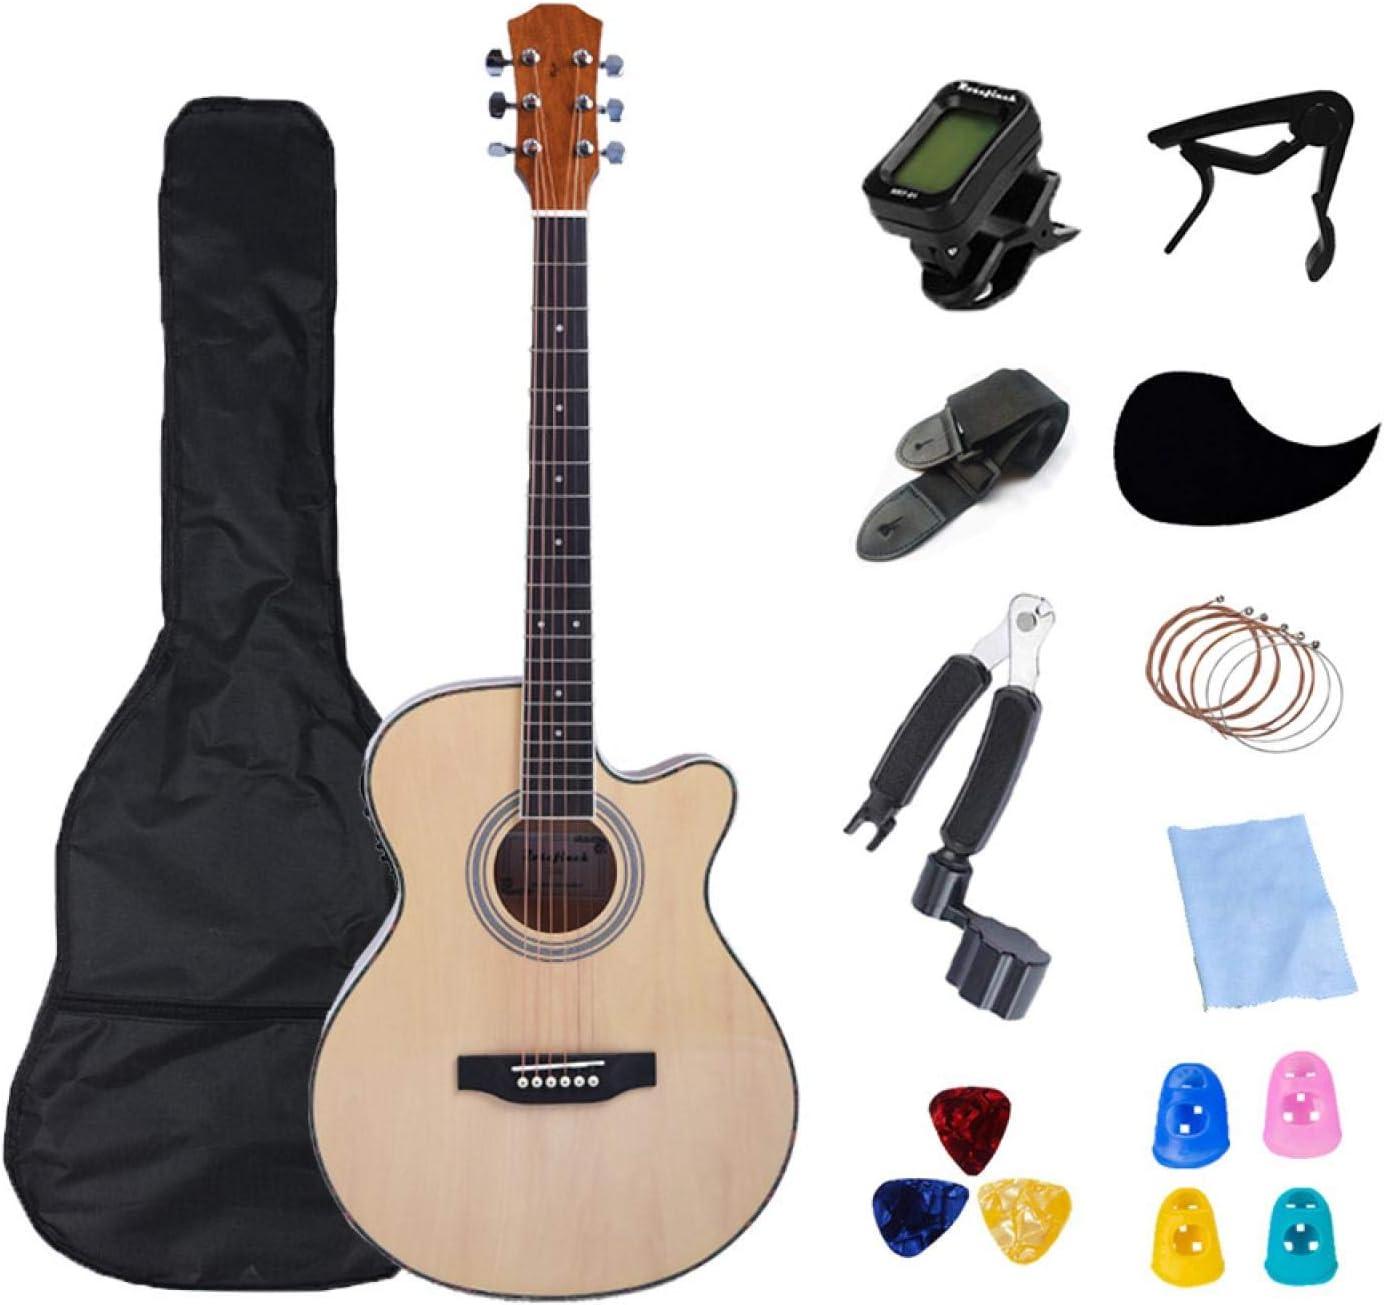 KEPOHK Guitarra eléctrica de 40 pulgadas Guitarra de cuerpo fino acústica Guitarra de 6 cuerdas Profesión Guitarra popular Pop para principiantes Set Regalo 40 pulgadas Madera